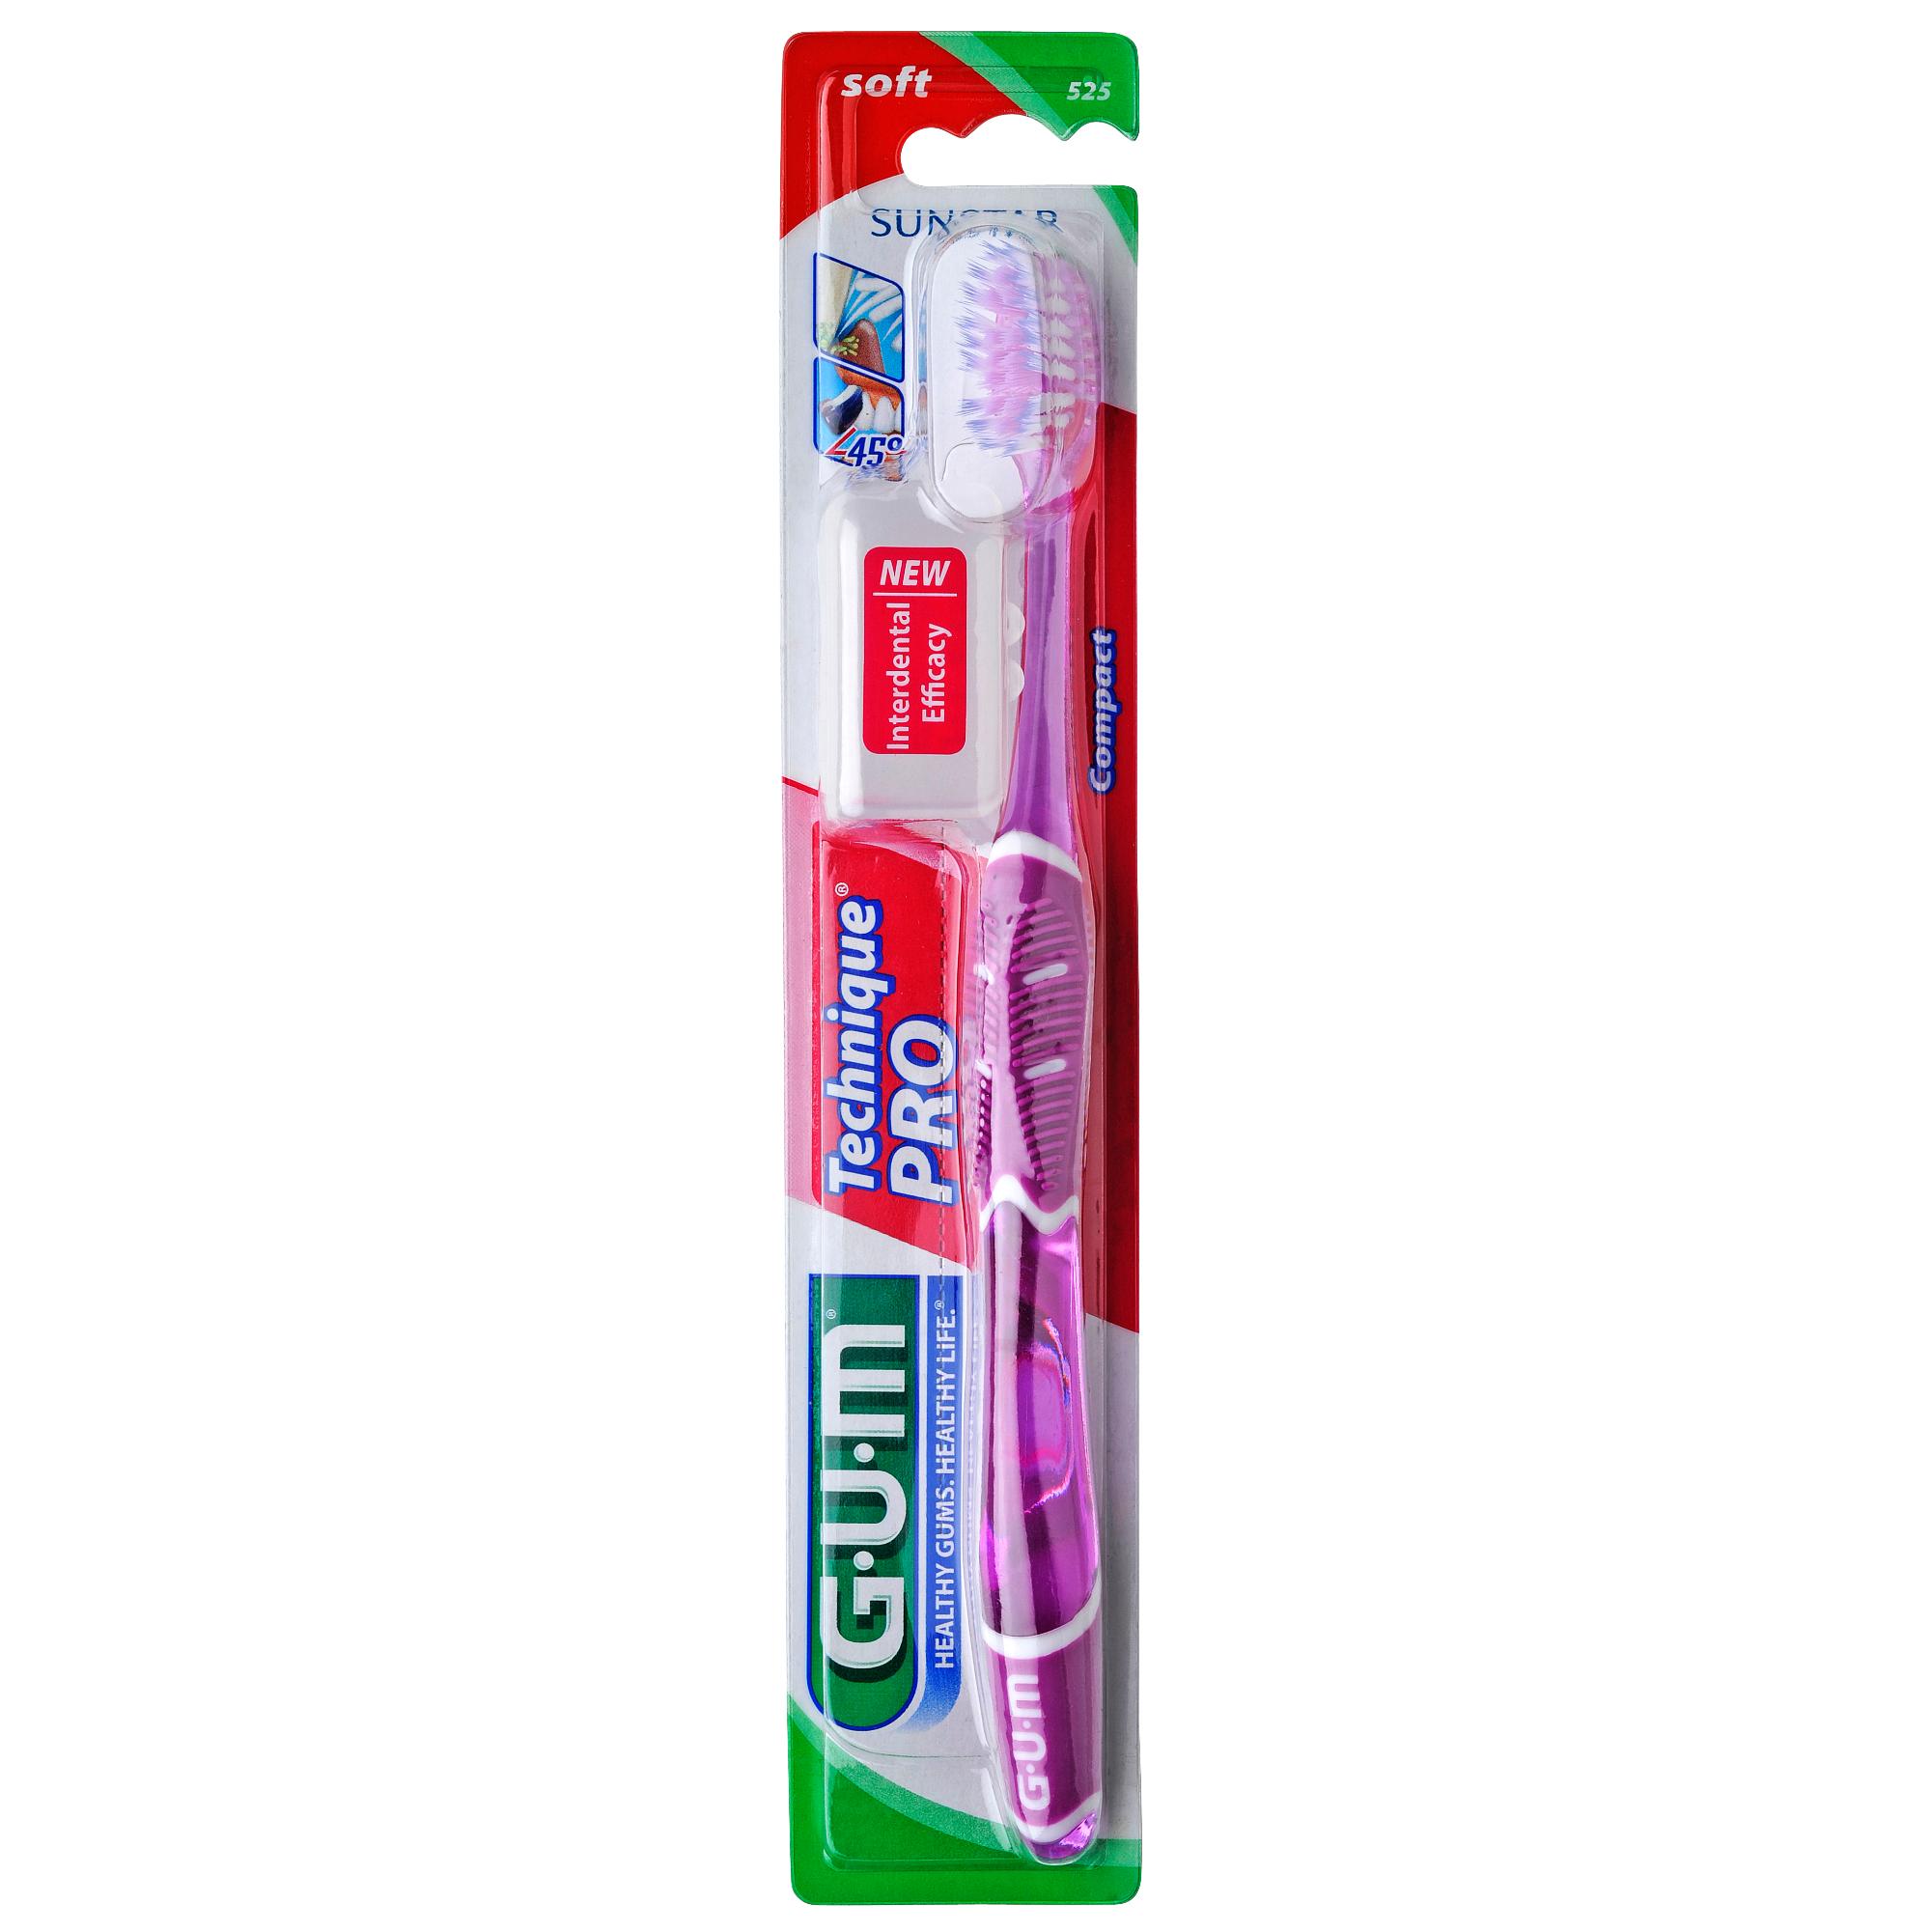 Gum Technique PRO Compact Soft Οδοντόβουρτσα με Θήκη Προστασίας (525) – μωβ